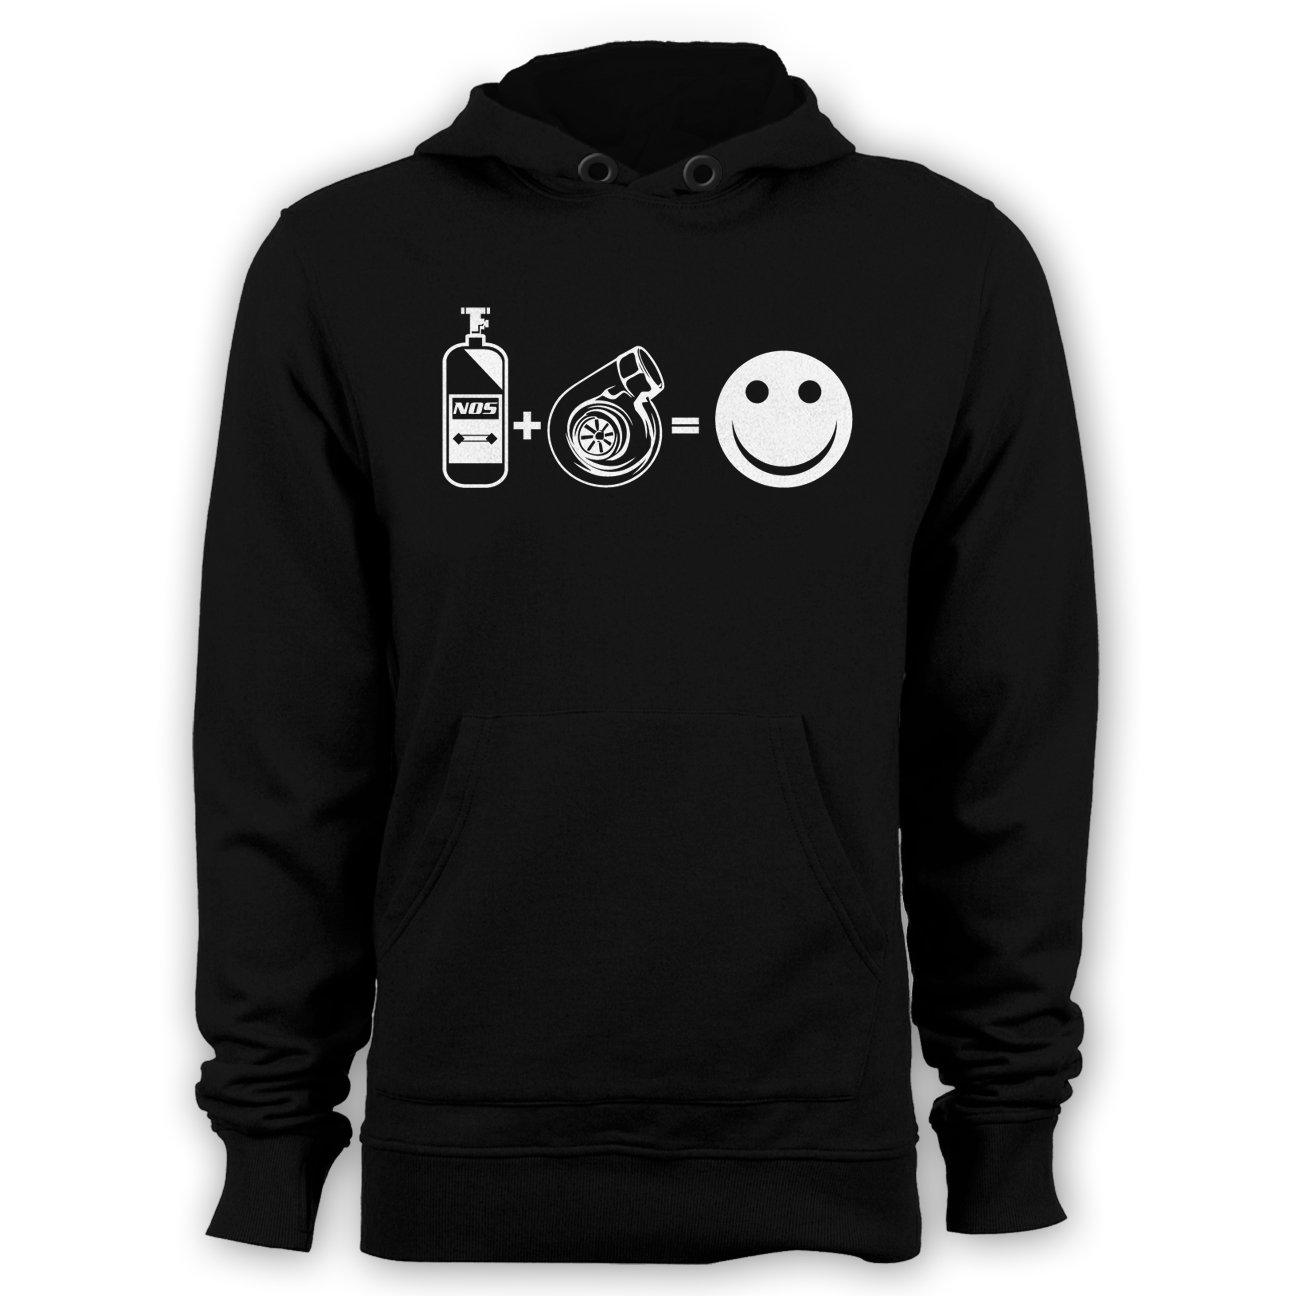 NOS+Turbo=Happy hoodie